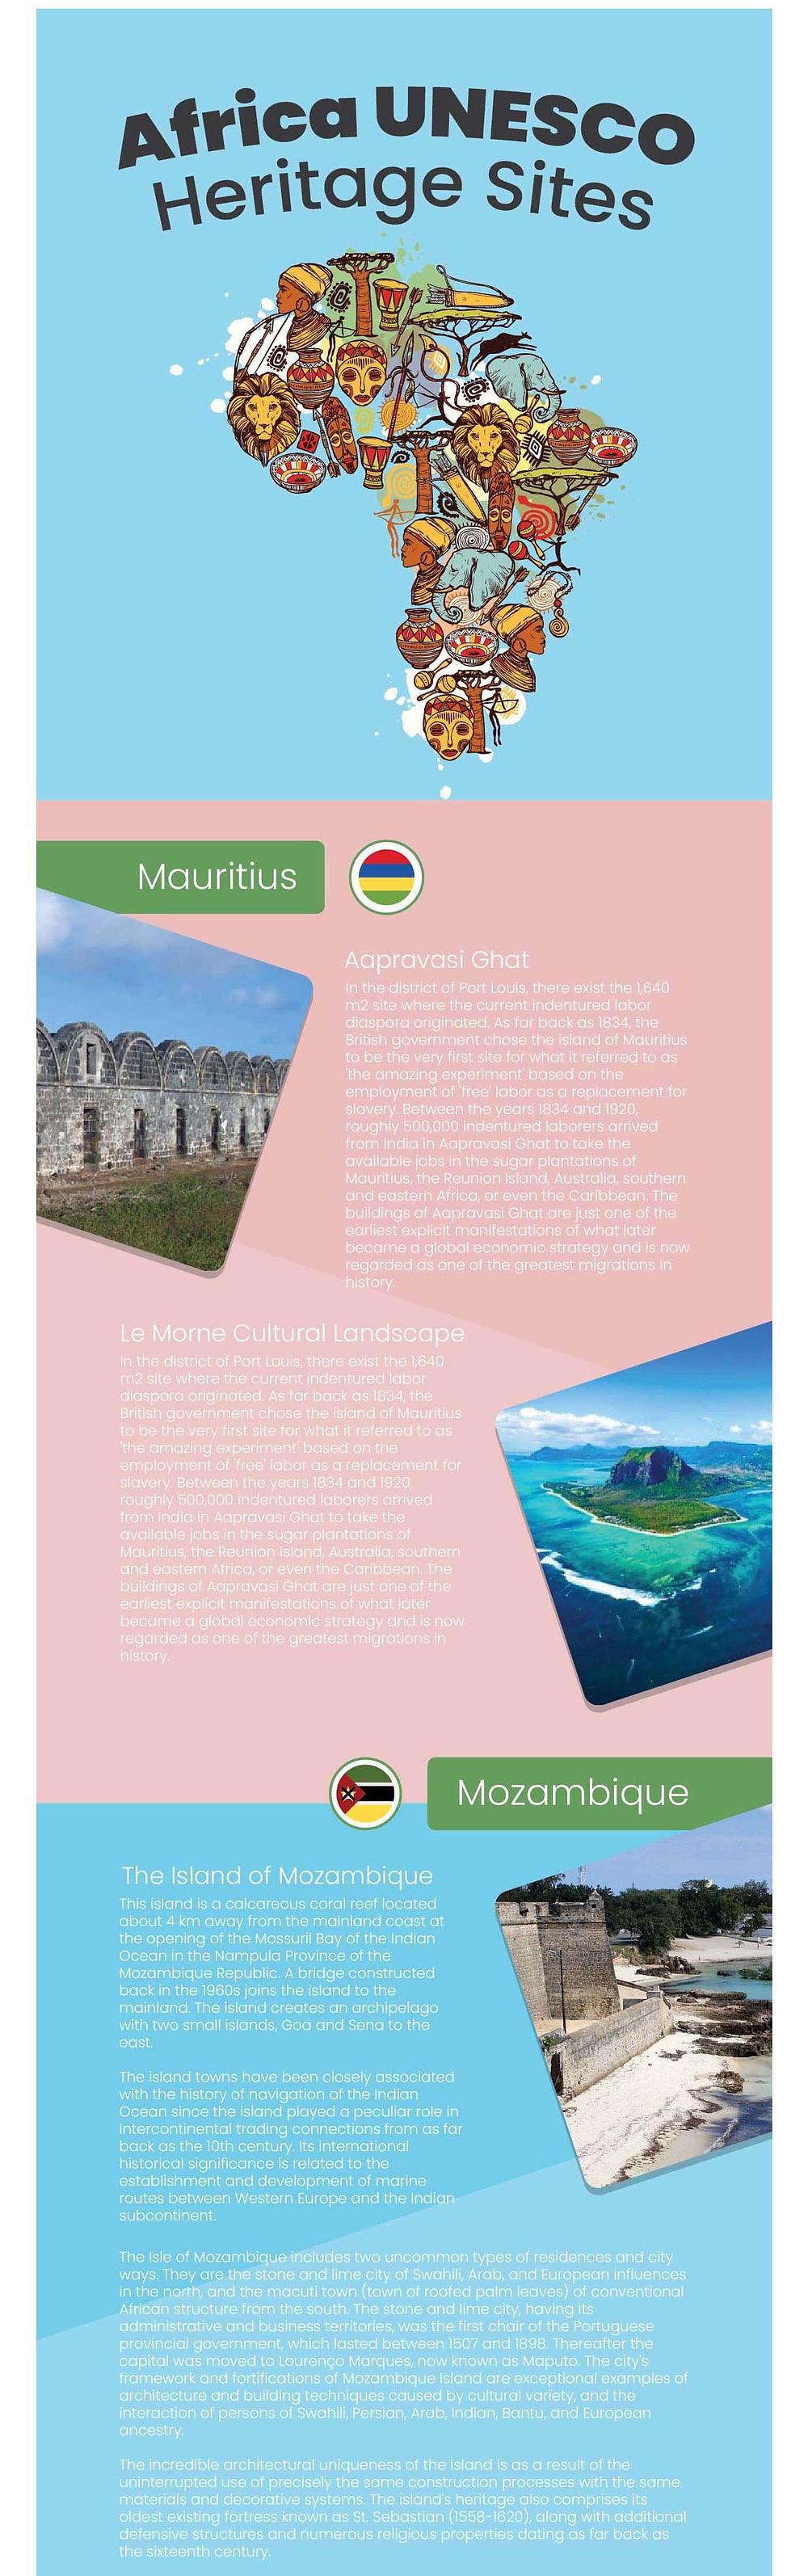 africa unesco heritage site